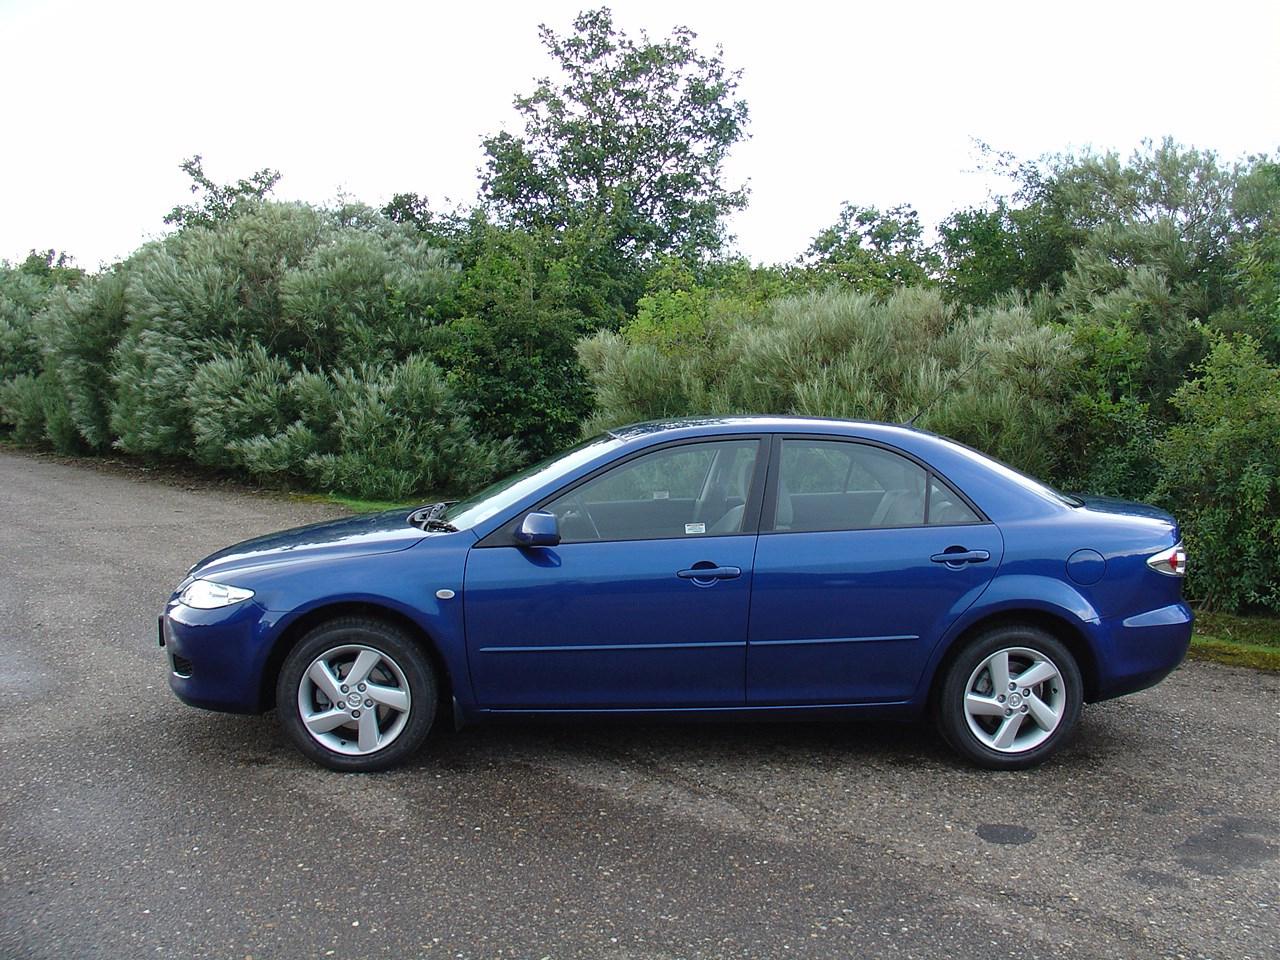 Mazda 6 Saloon (2002 - 2007) Photos   Parkers